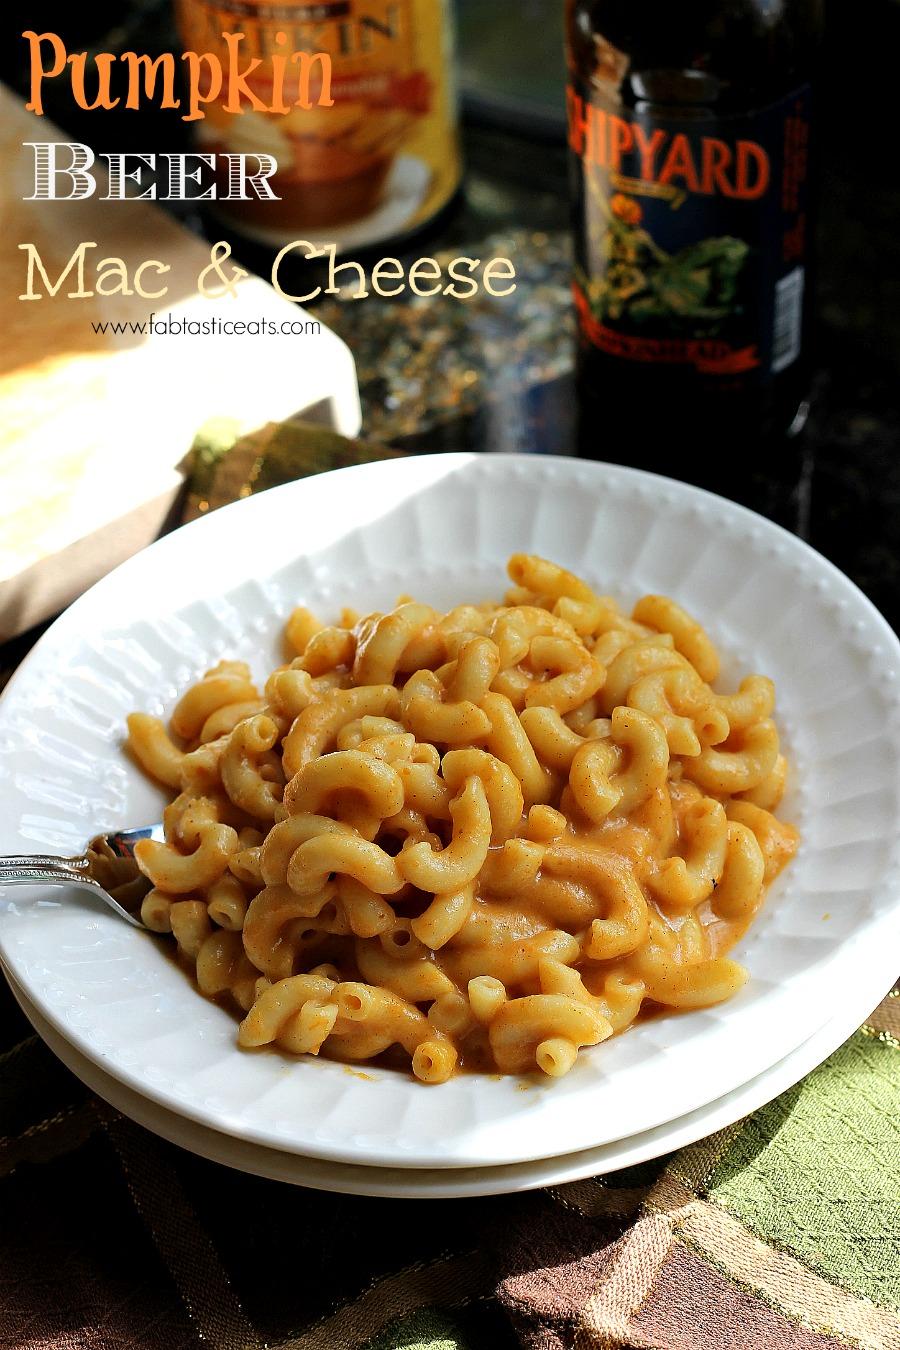 Pumpkin Beer Macaroni and Cheese   Fabtastic Eats